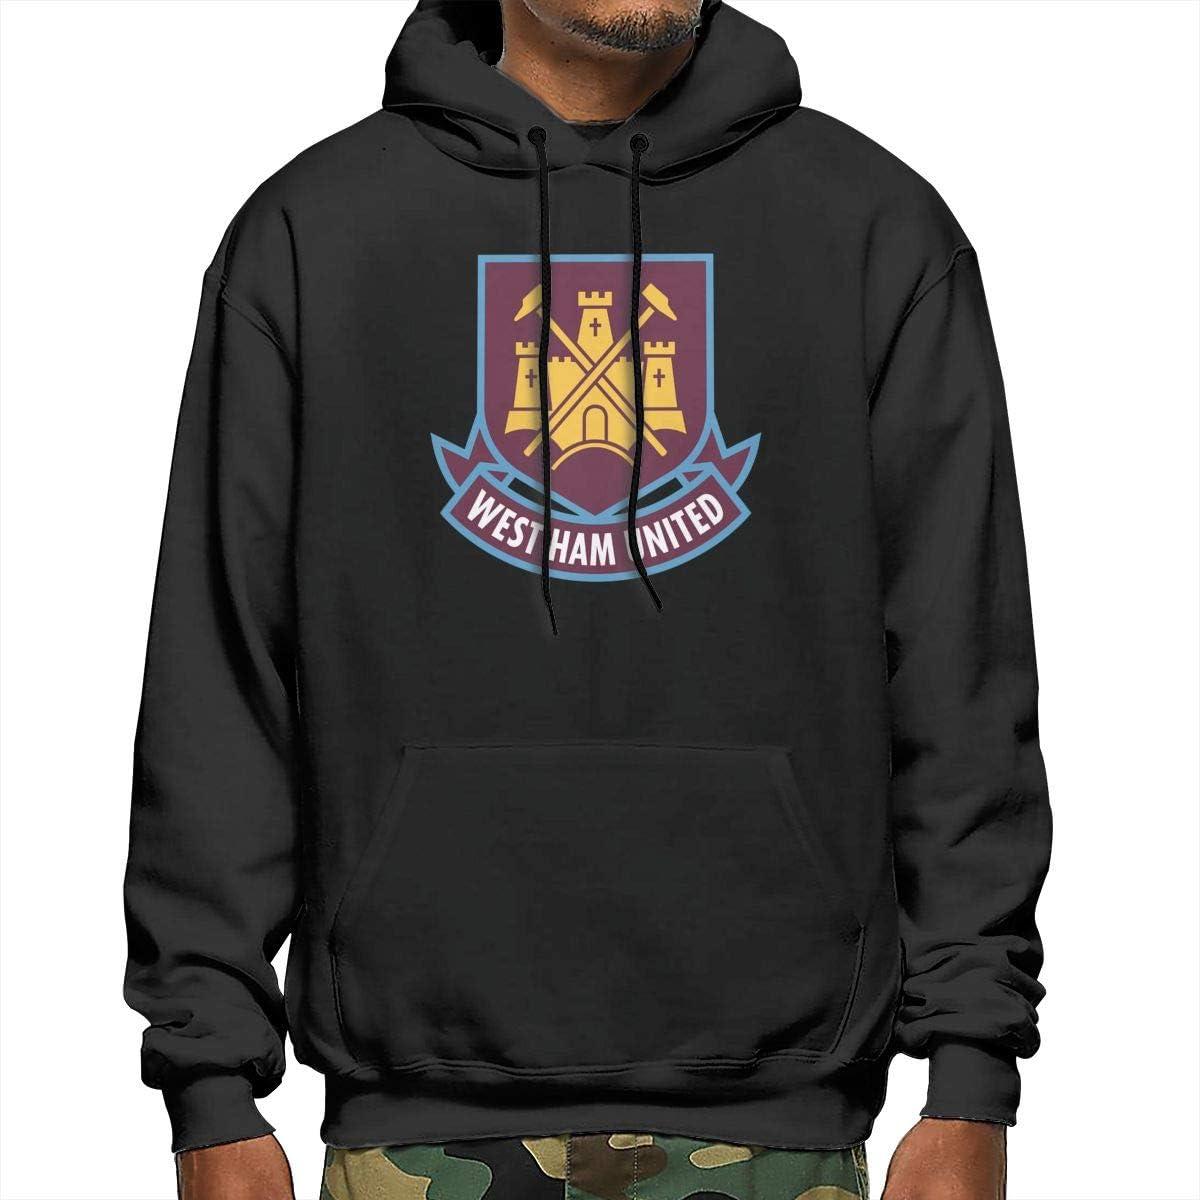 GanCheng West Ham United Football Club Logo Hoodies Black for Mens Top Sweatshirt